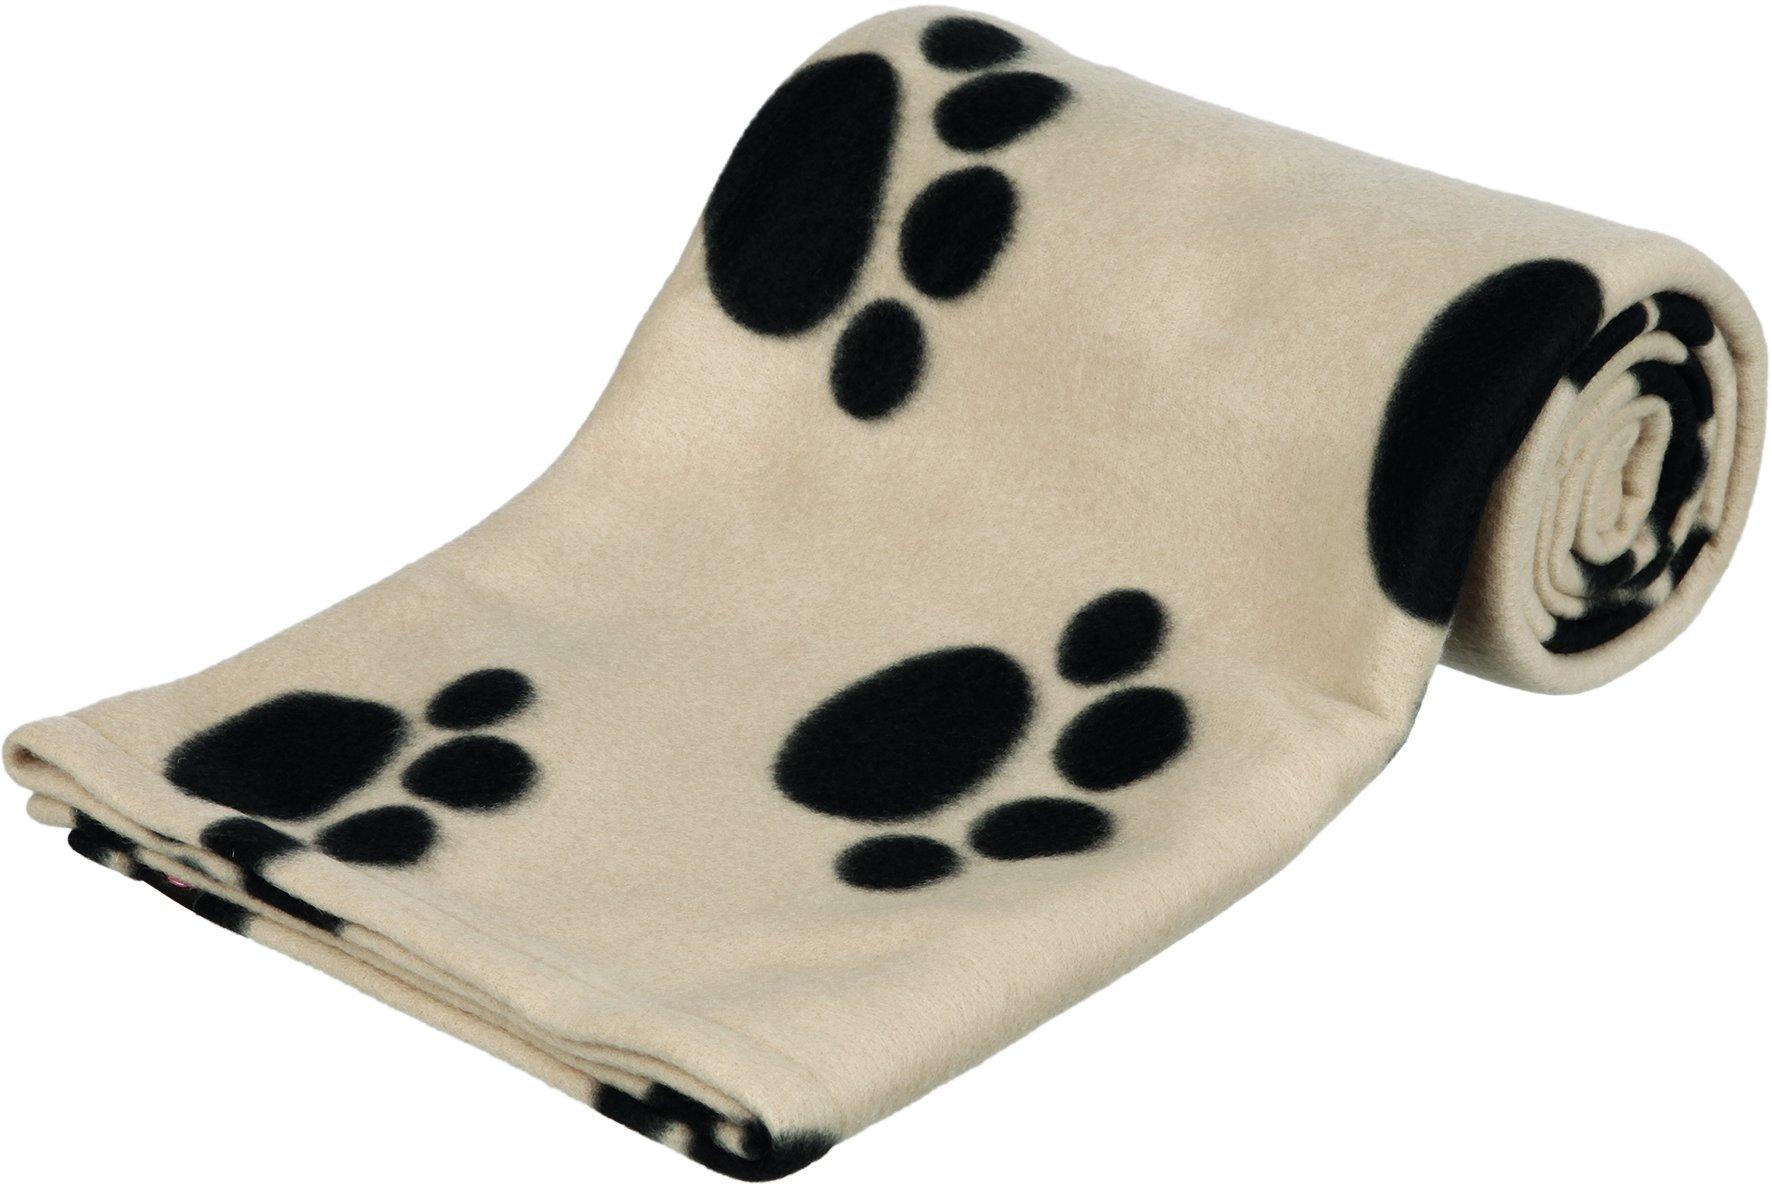 Trixie Barney Fleece Blanket 150 x 100cm Beige